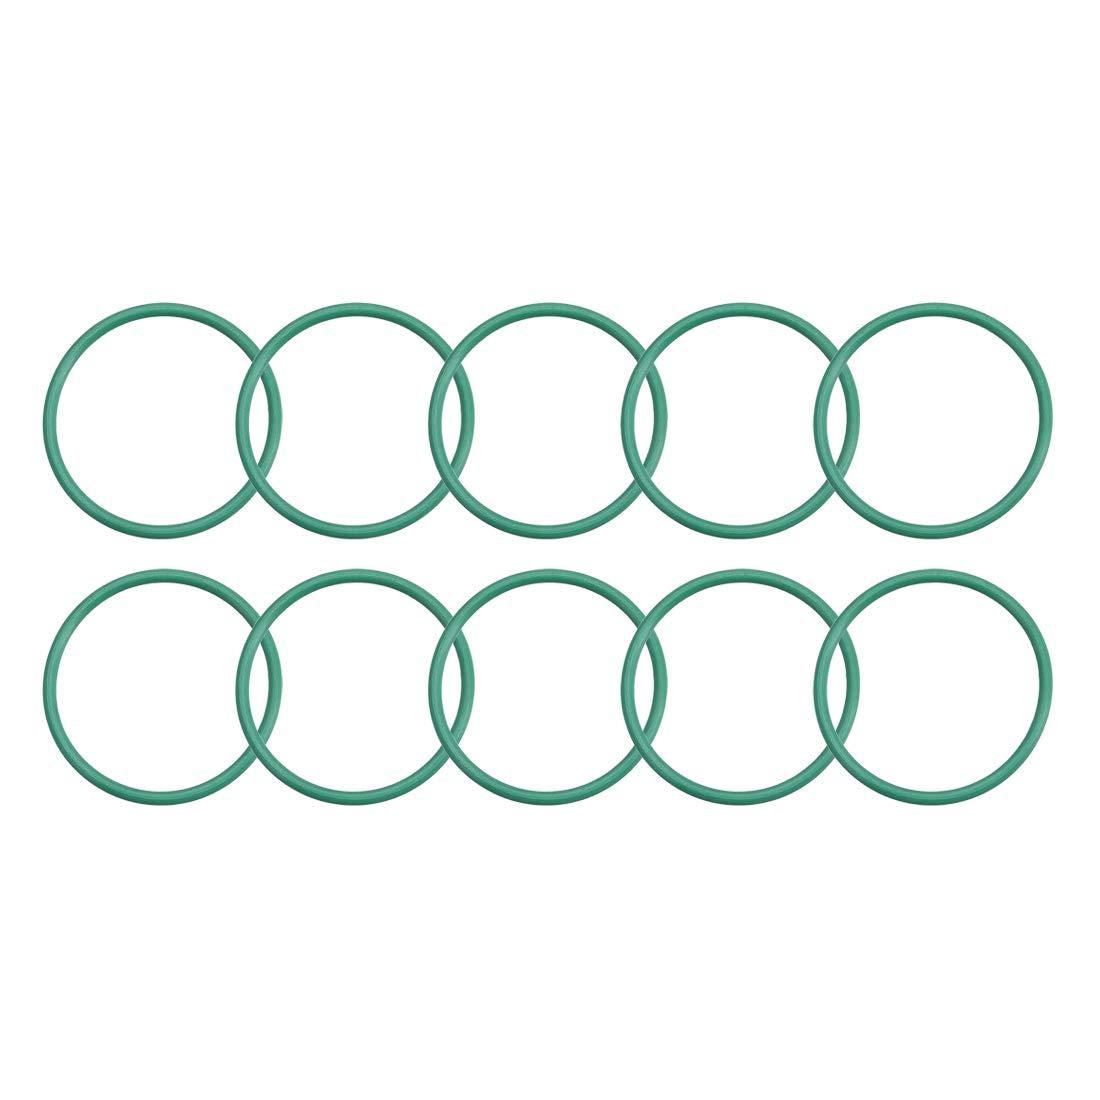 1.5mm Width 29mm Inner Diameter uxcell Fluorine Rubber O Rings Seal Gasket Green 10Pcs 32mm OD